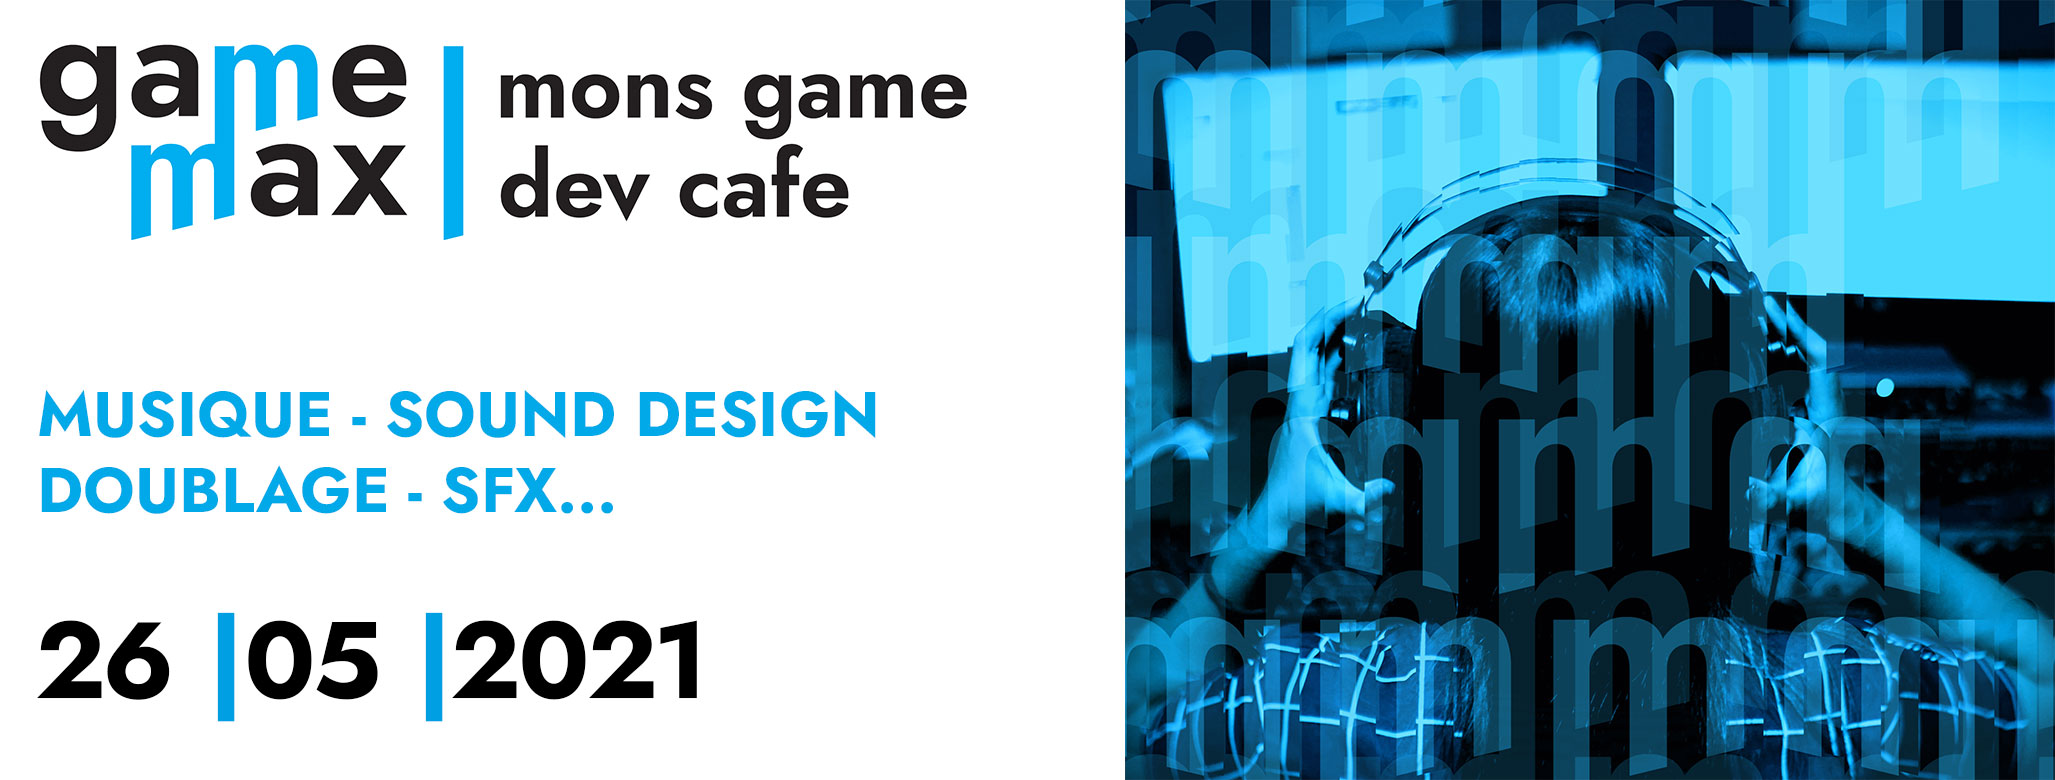 GameDevCafe_260521_Visuel_230421